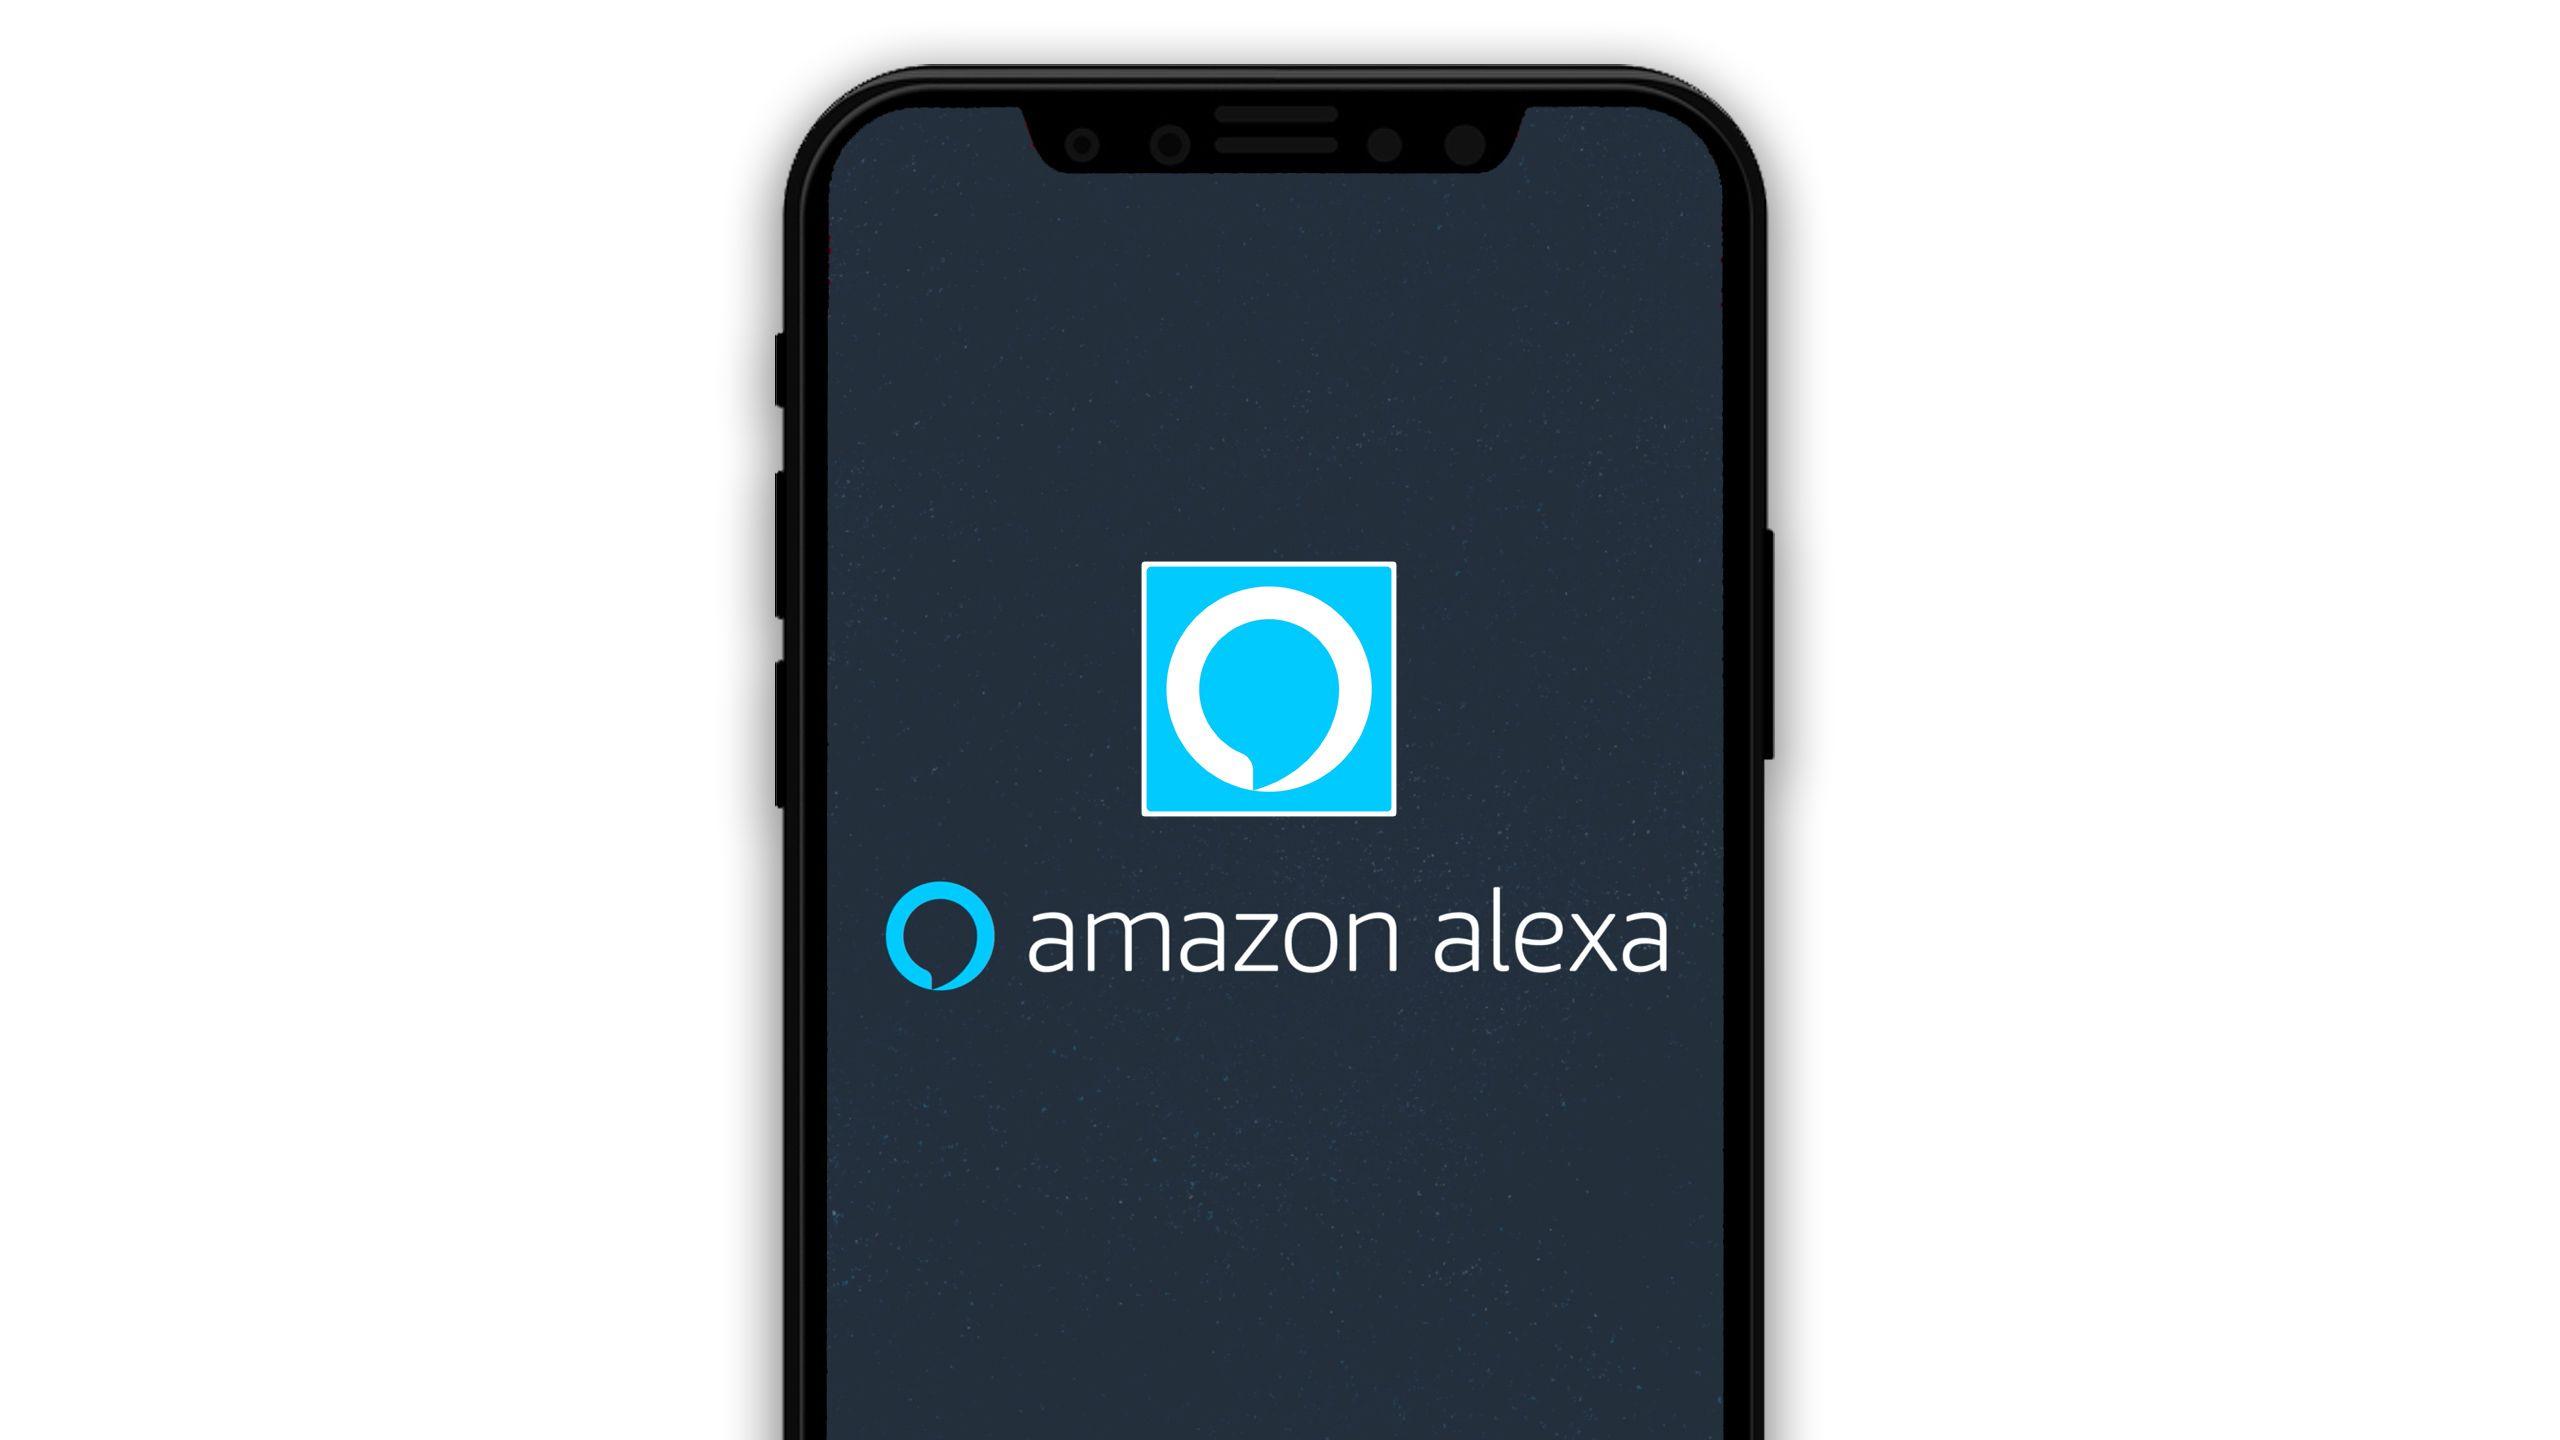 Promo-FlashBrief-AlexaApp-2560